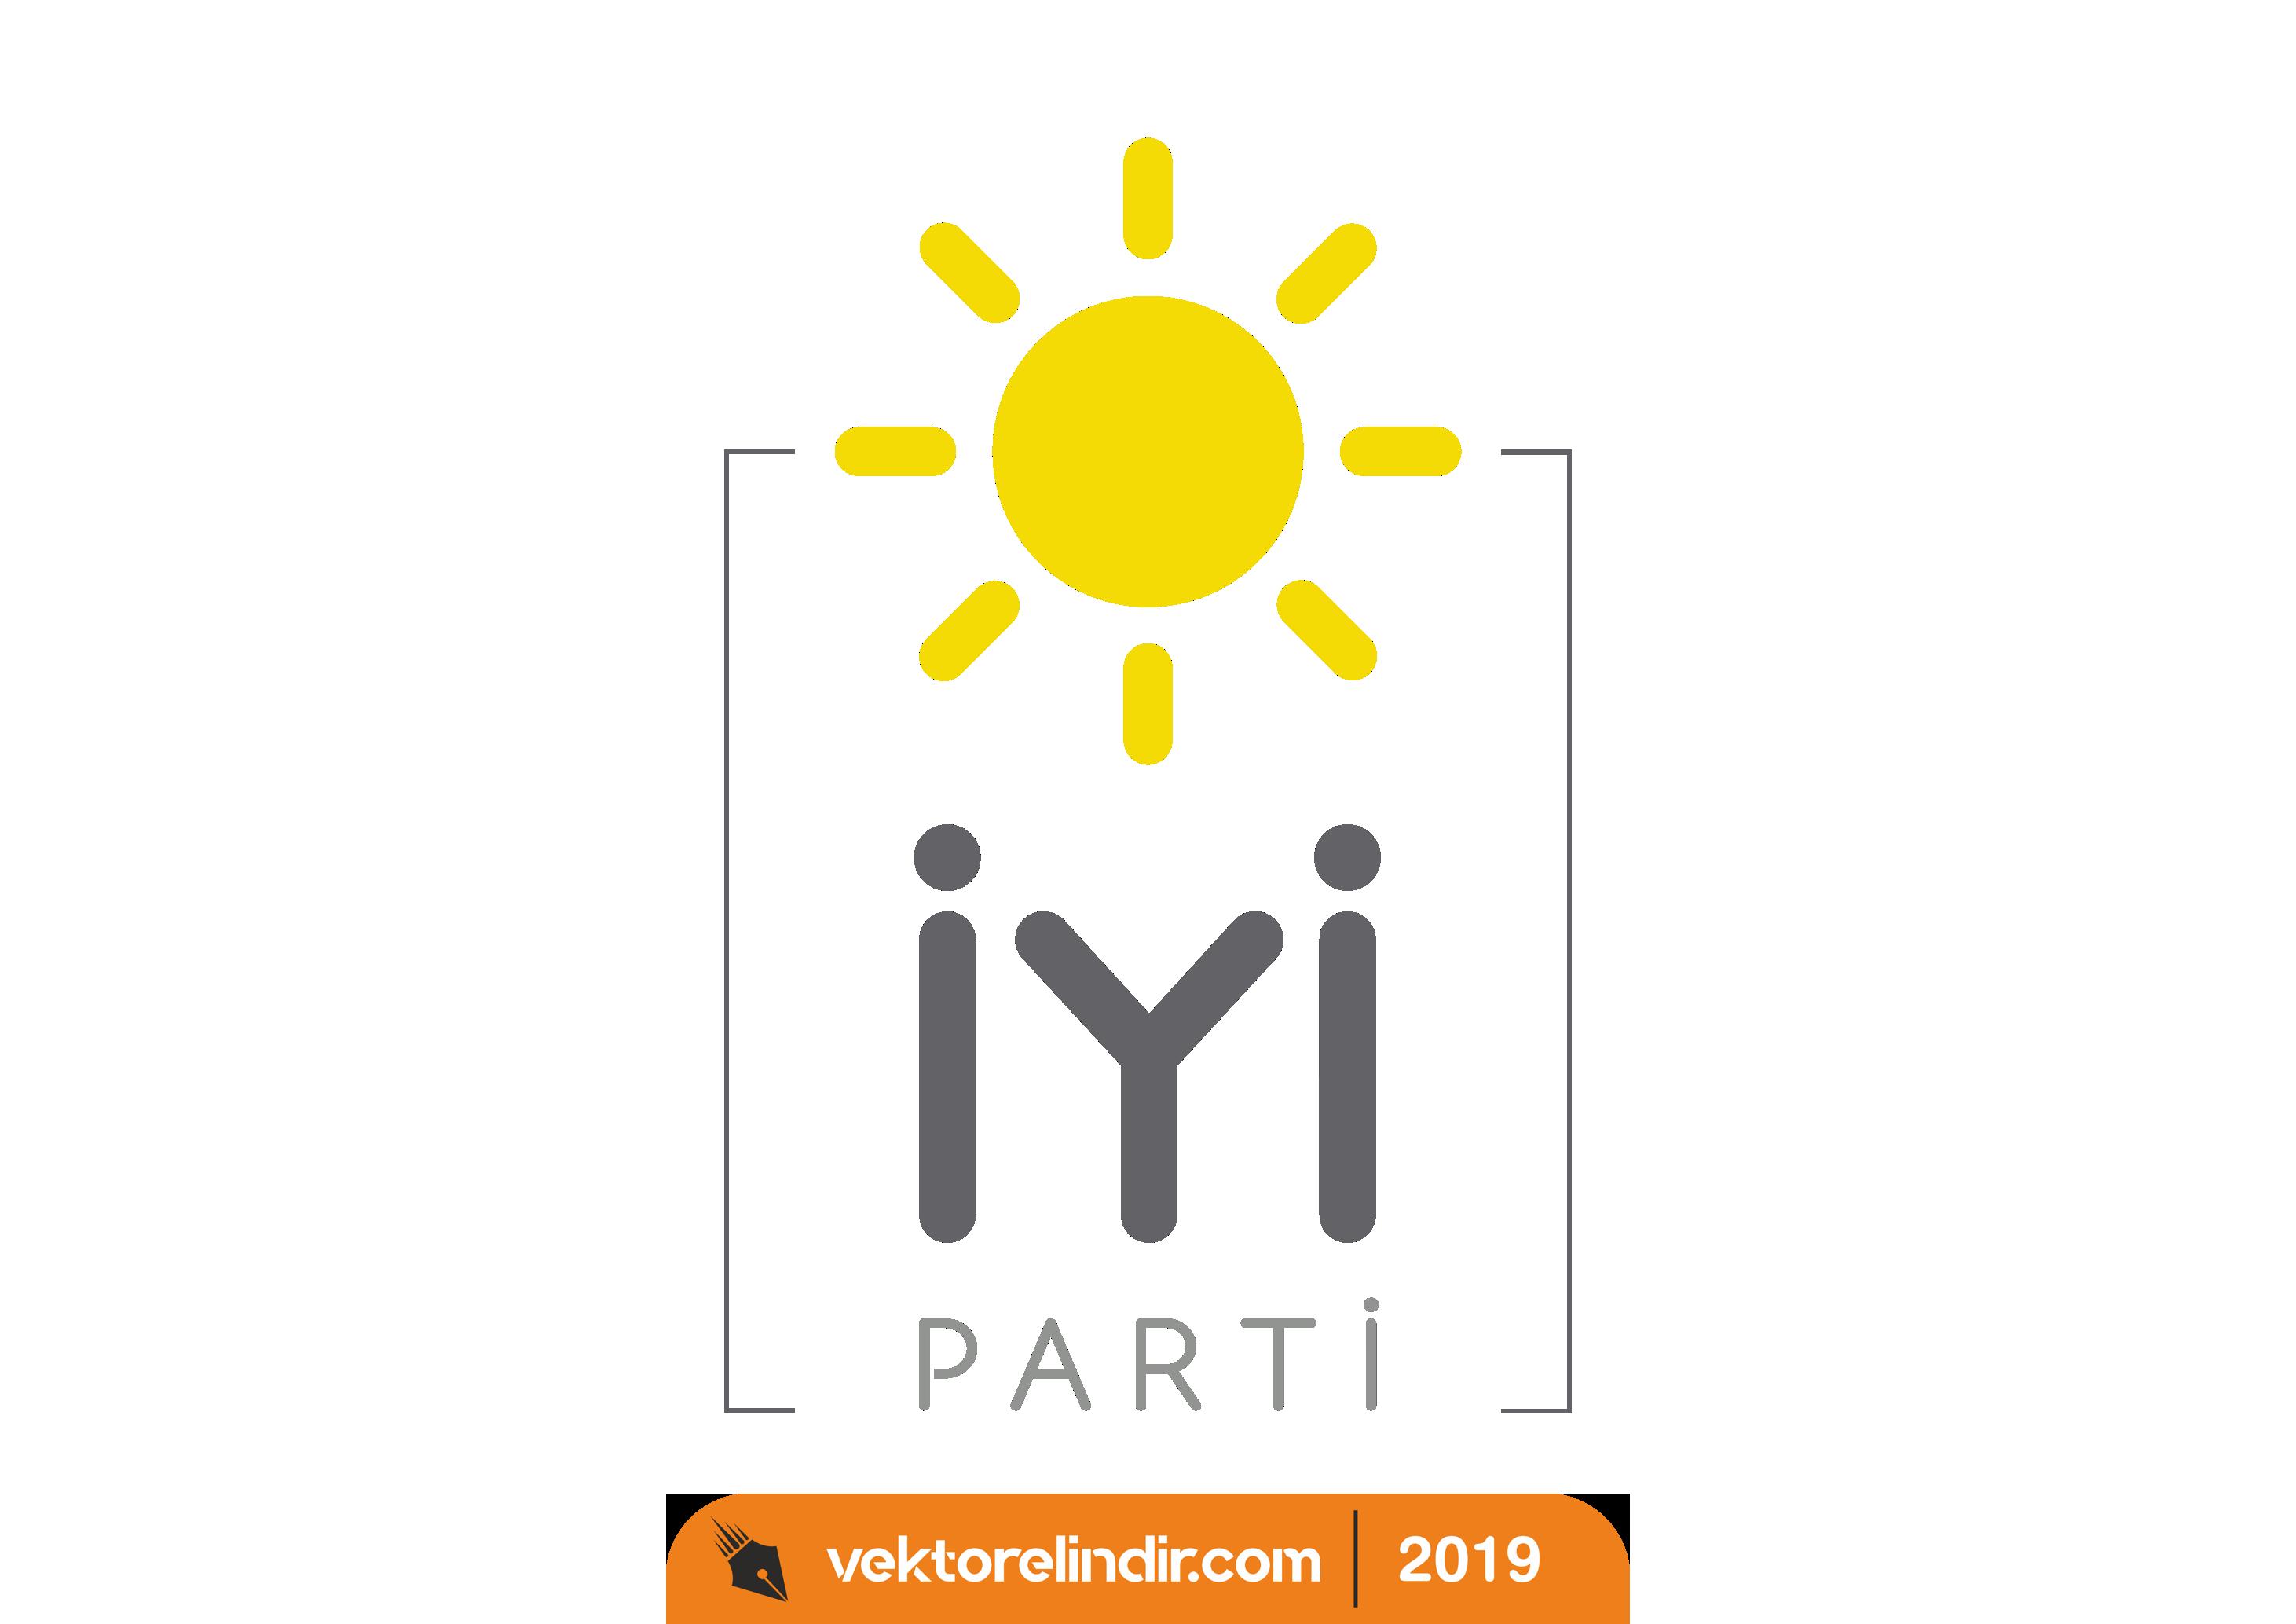 İyi Parti Amblem Logo Png, Vektörel